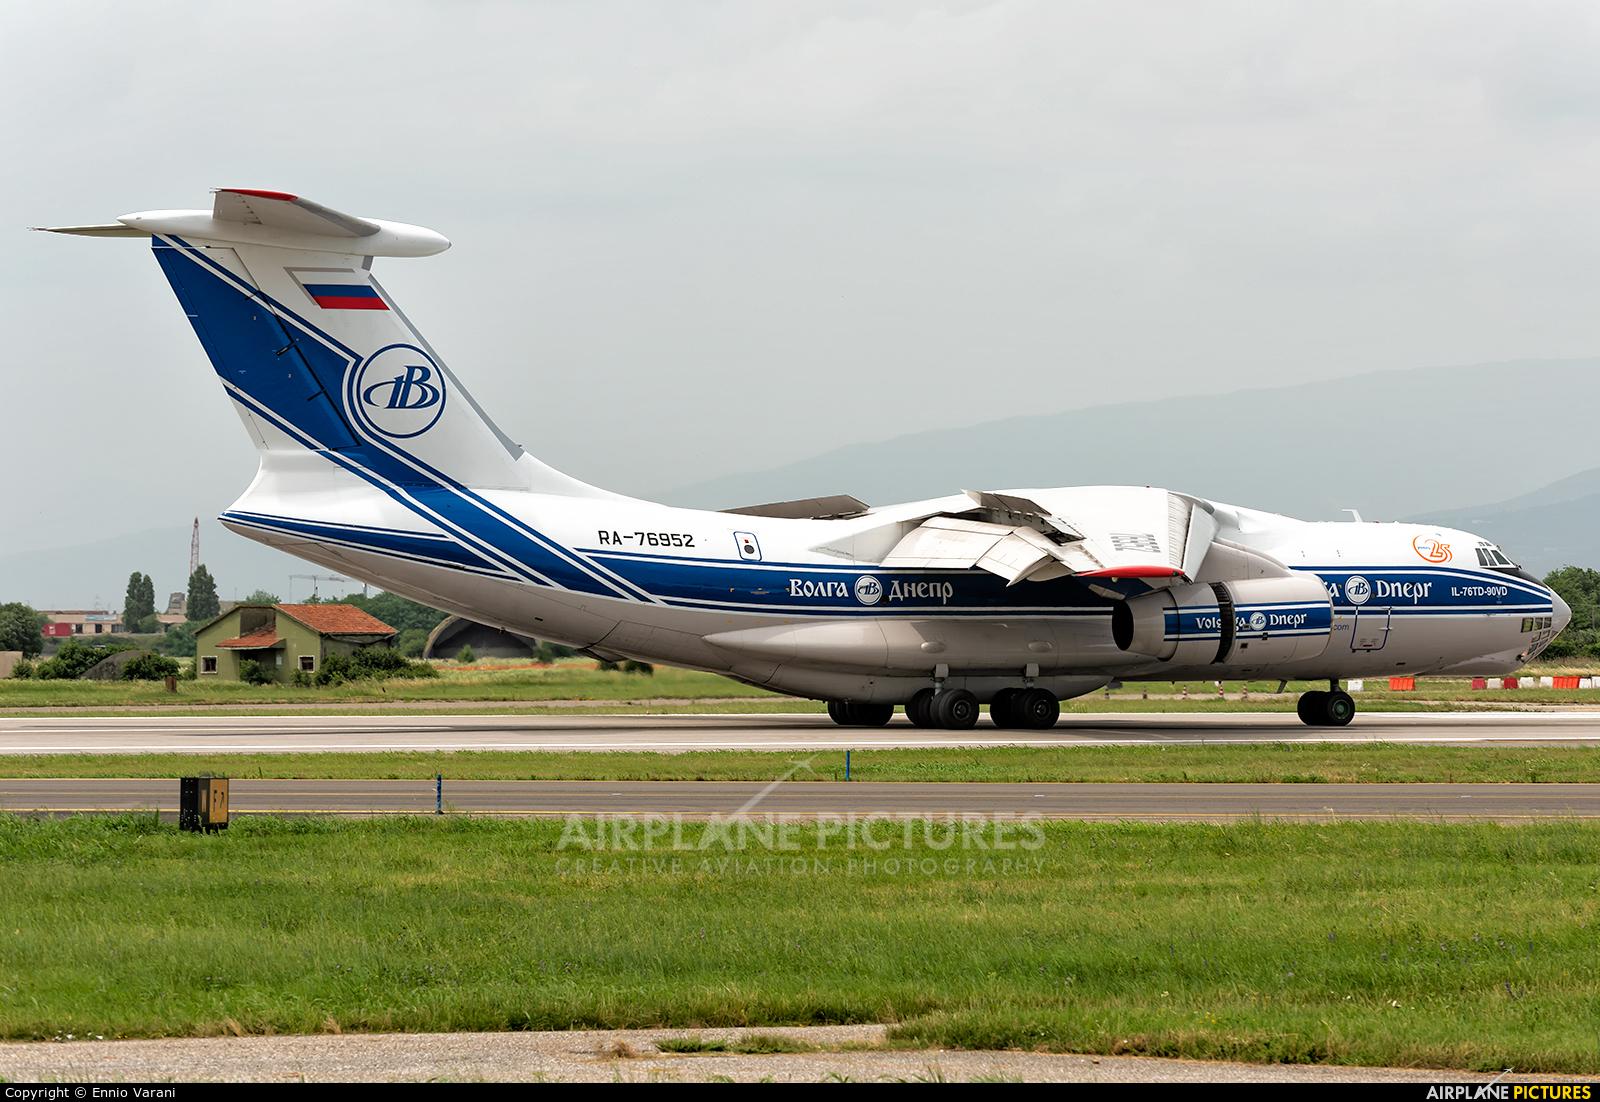 Volga Dnepr Airlines RA-76952 aircraft at Verona - Villafranca